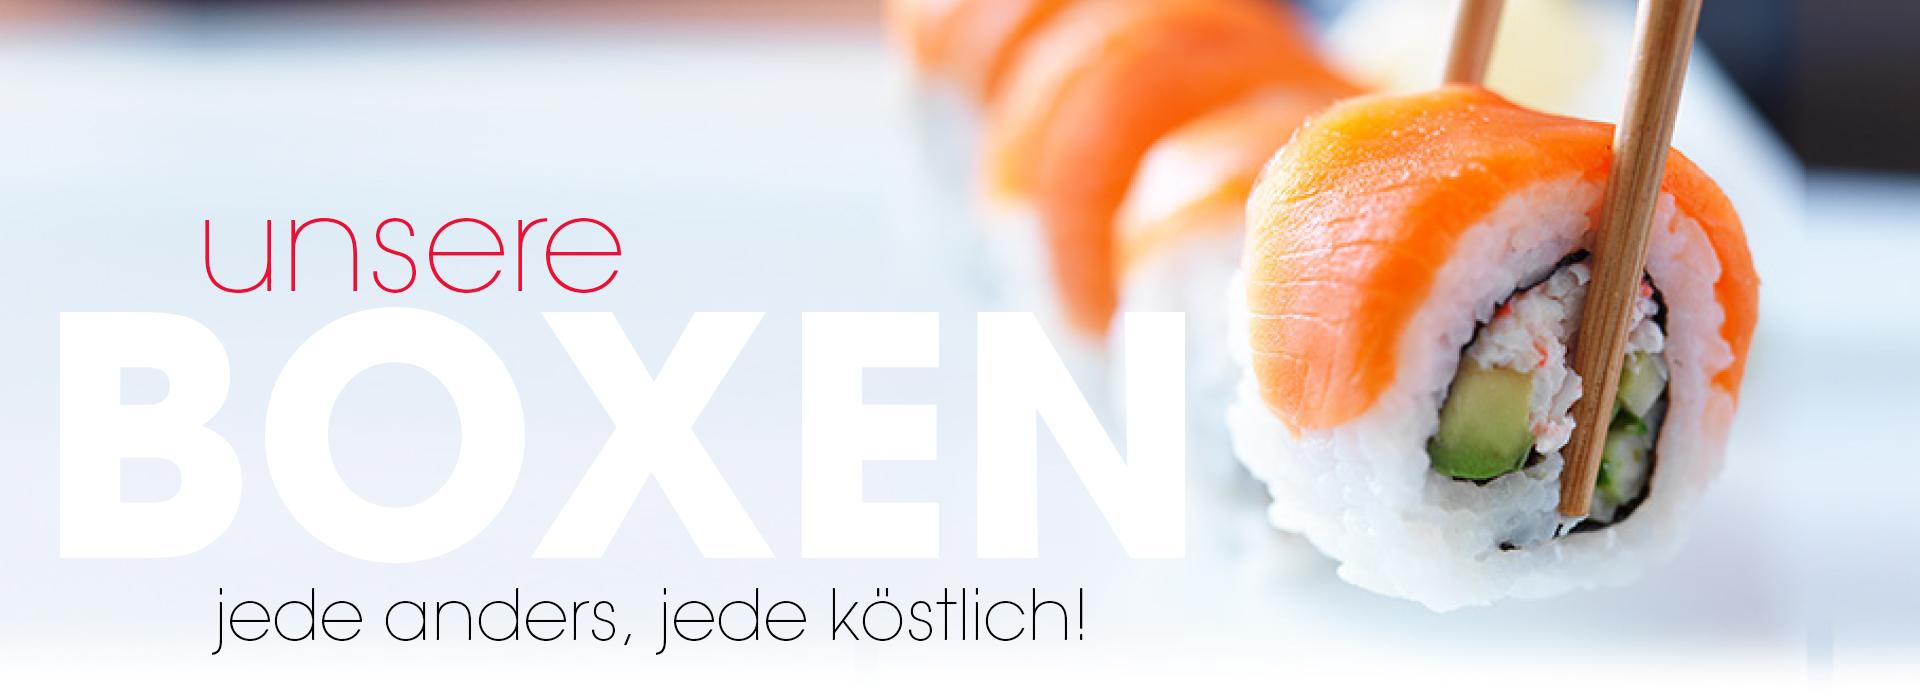 shizoo. Boxen Sushi Lieferservice München